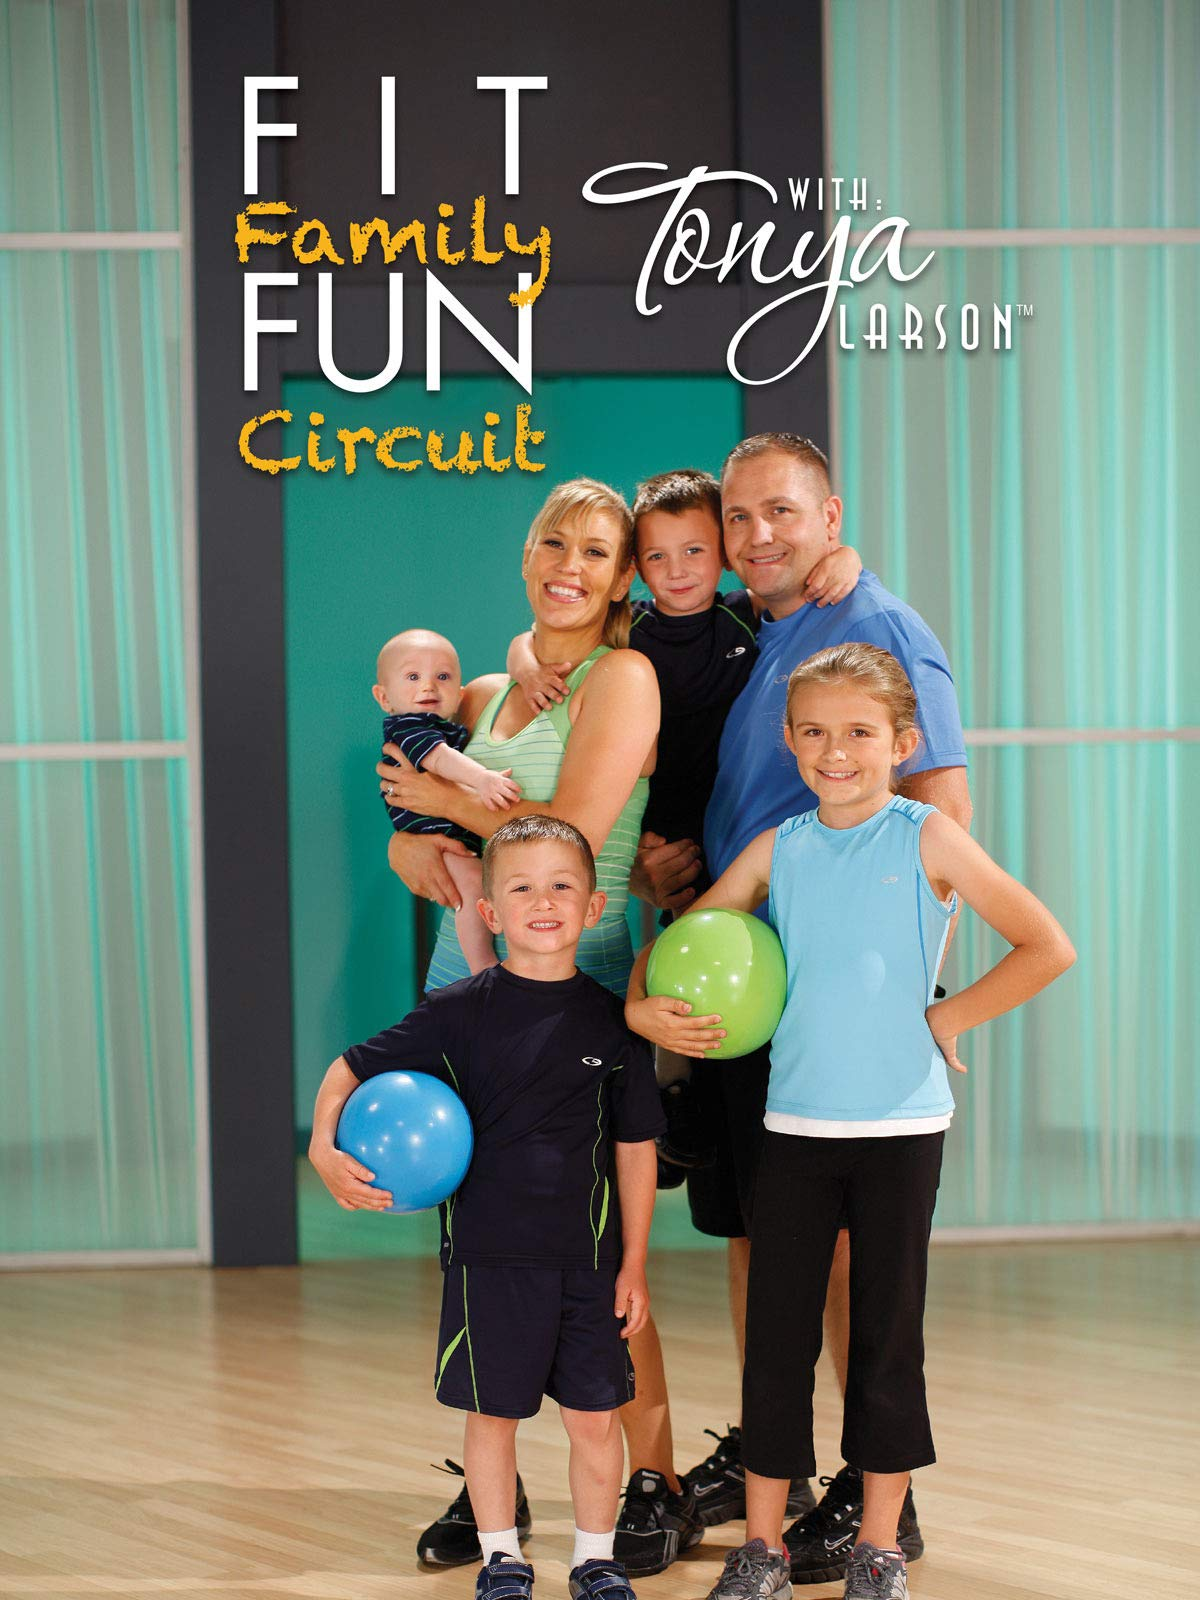 Fit Family Fun with Tonya Larson